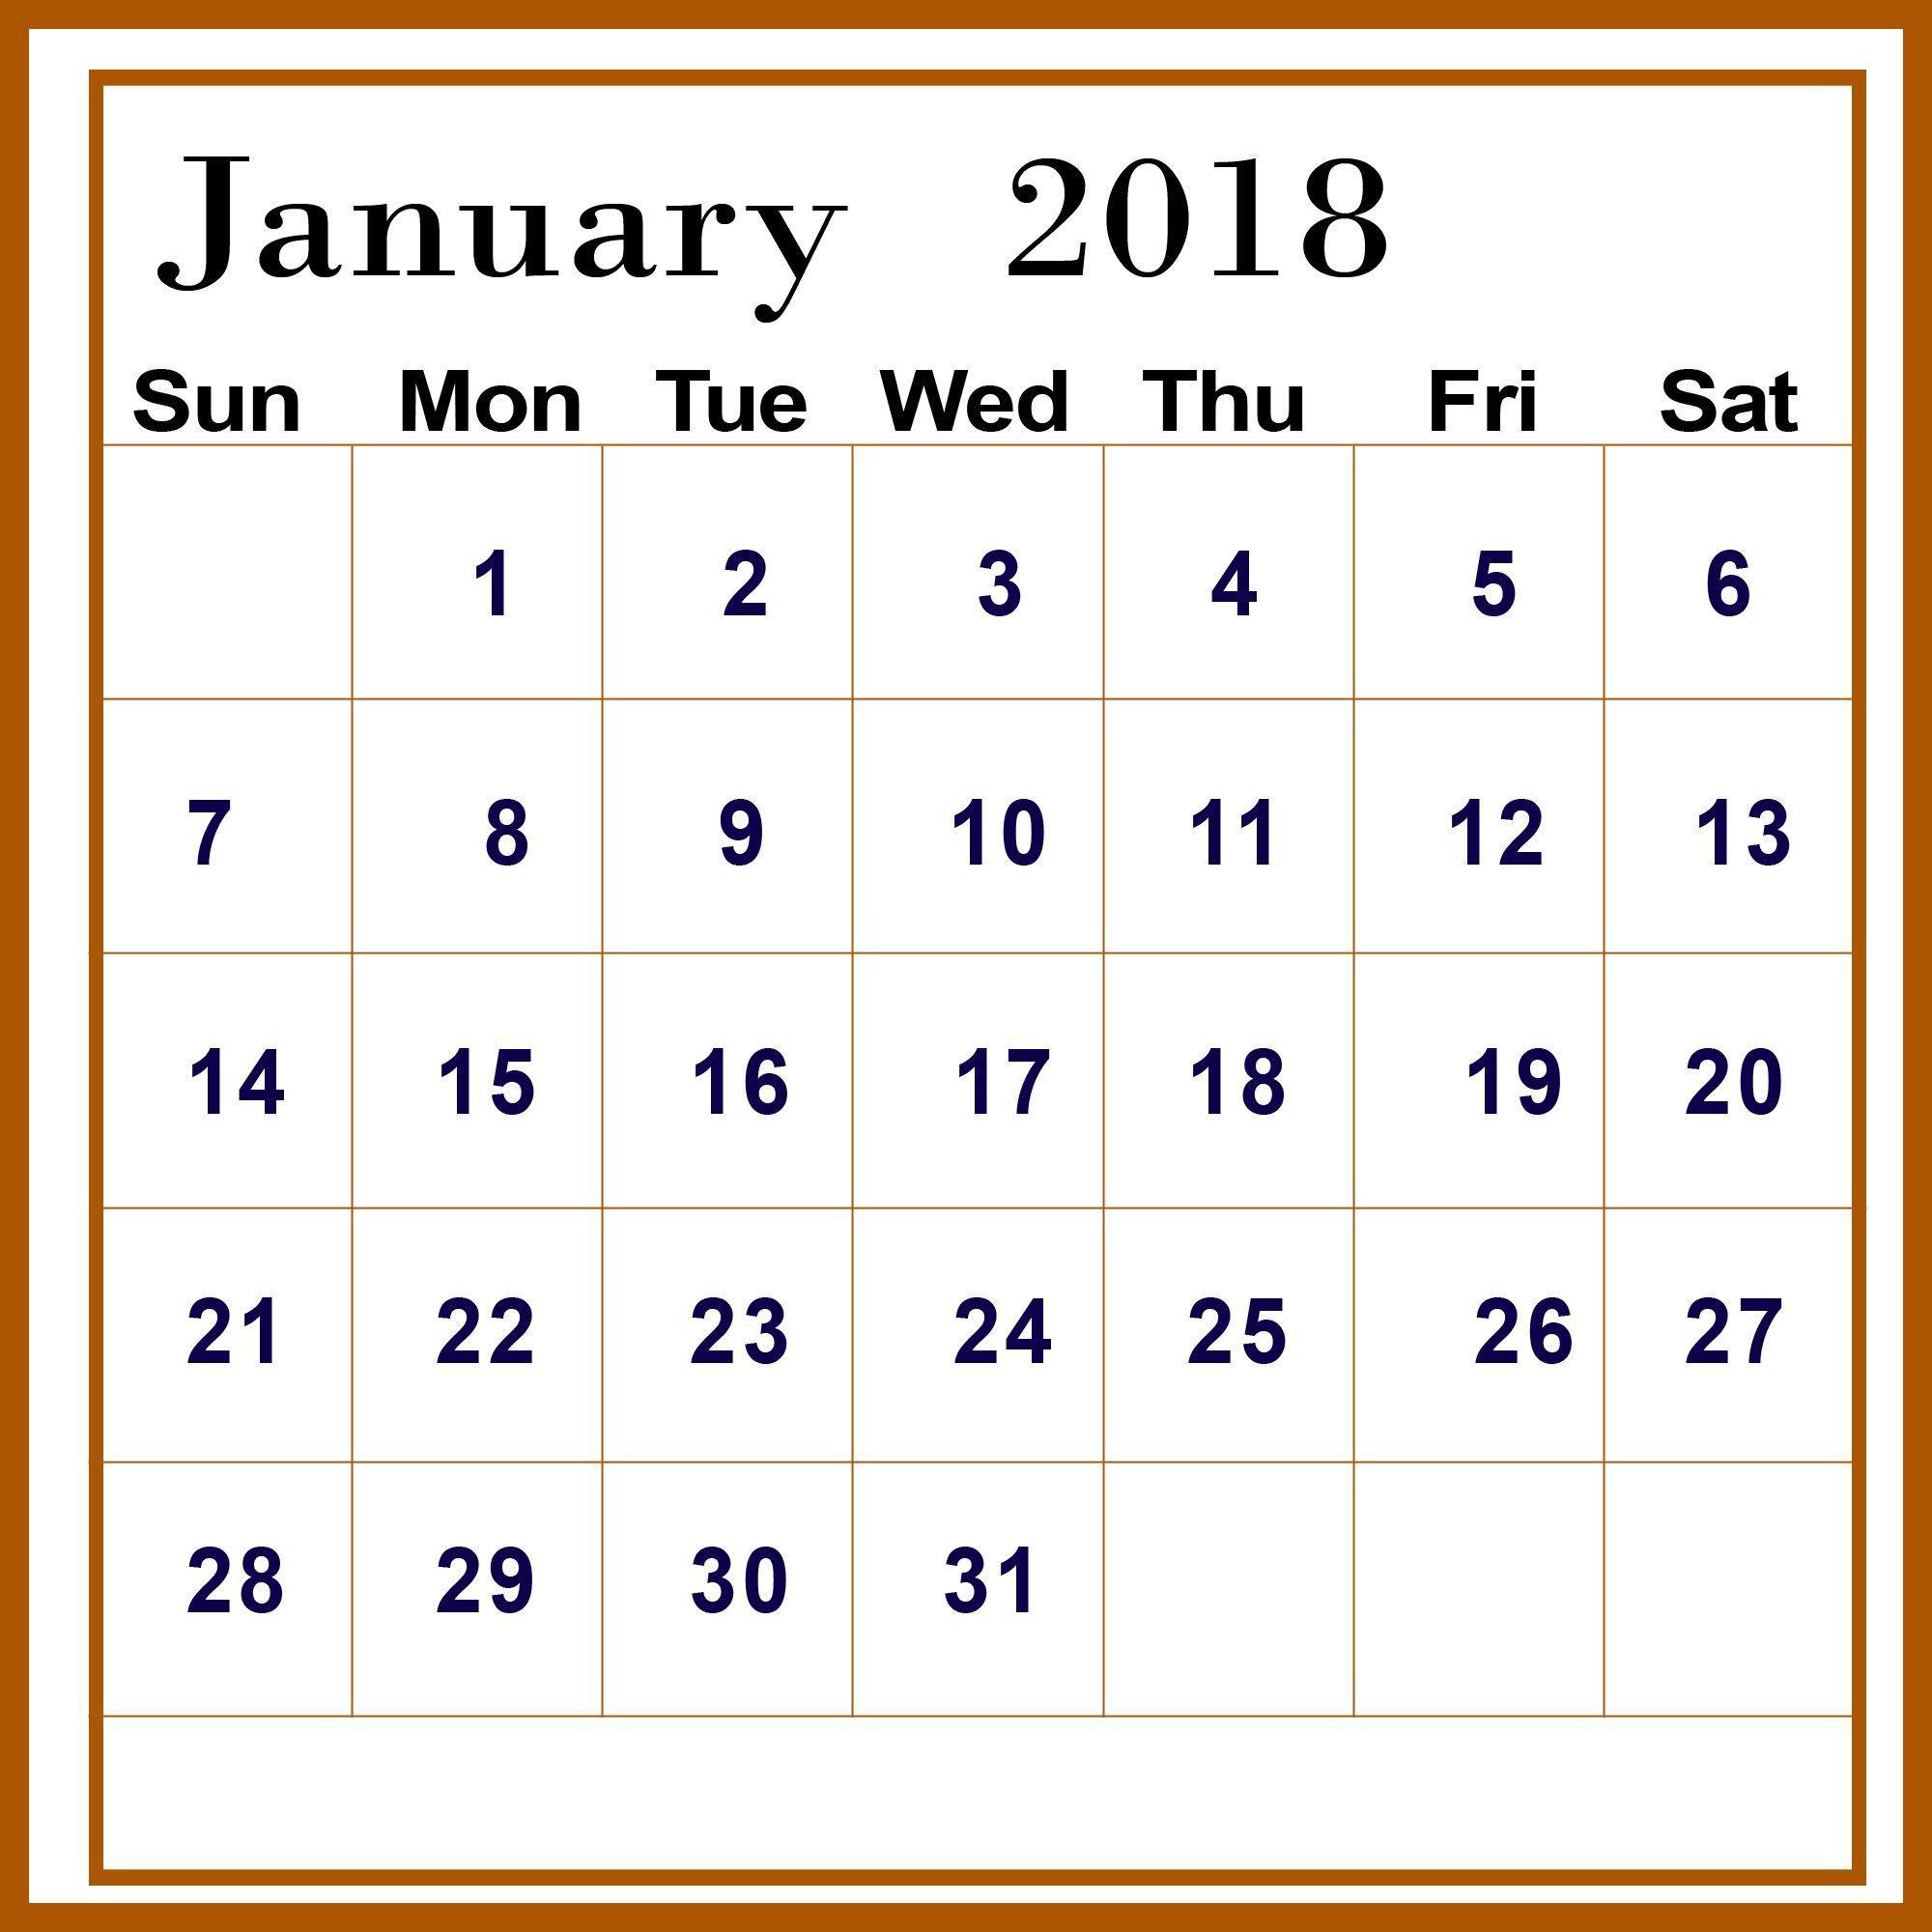 Desktop Wallpaper January 2014: January 2018 Calendar Wallpapers